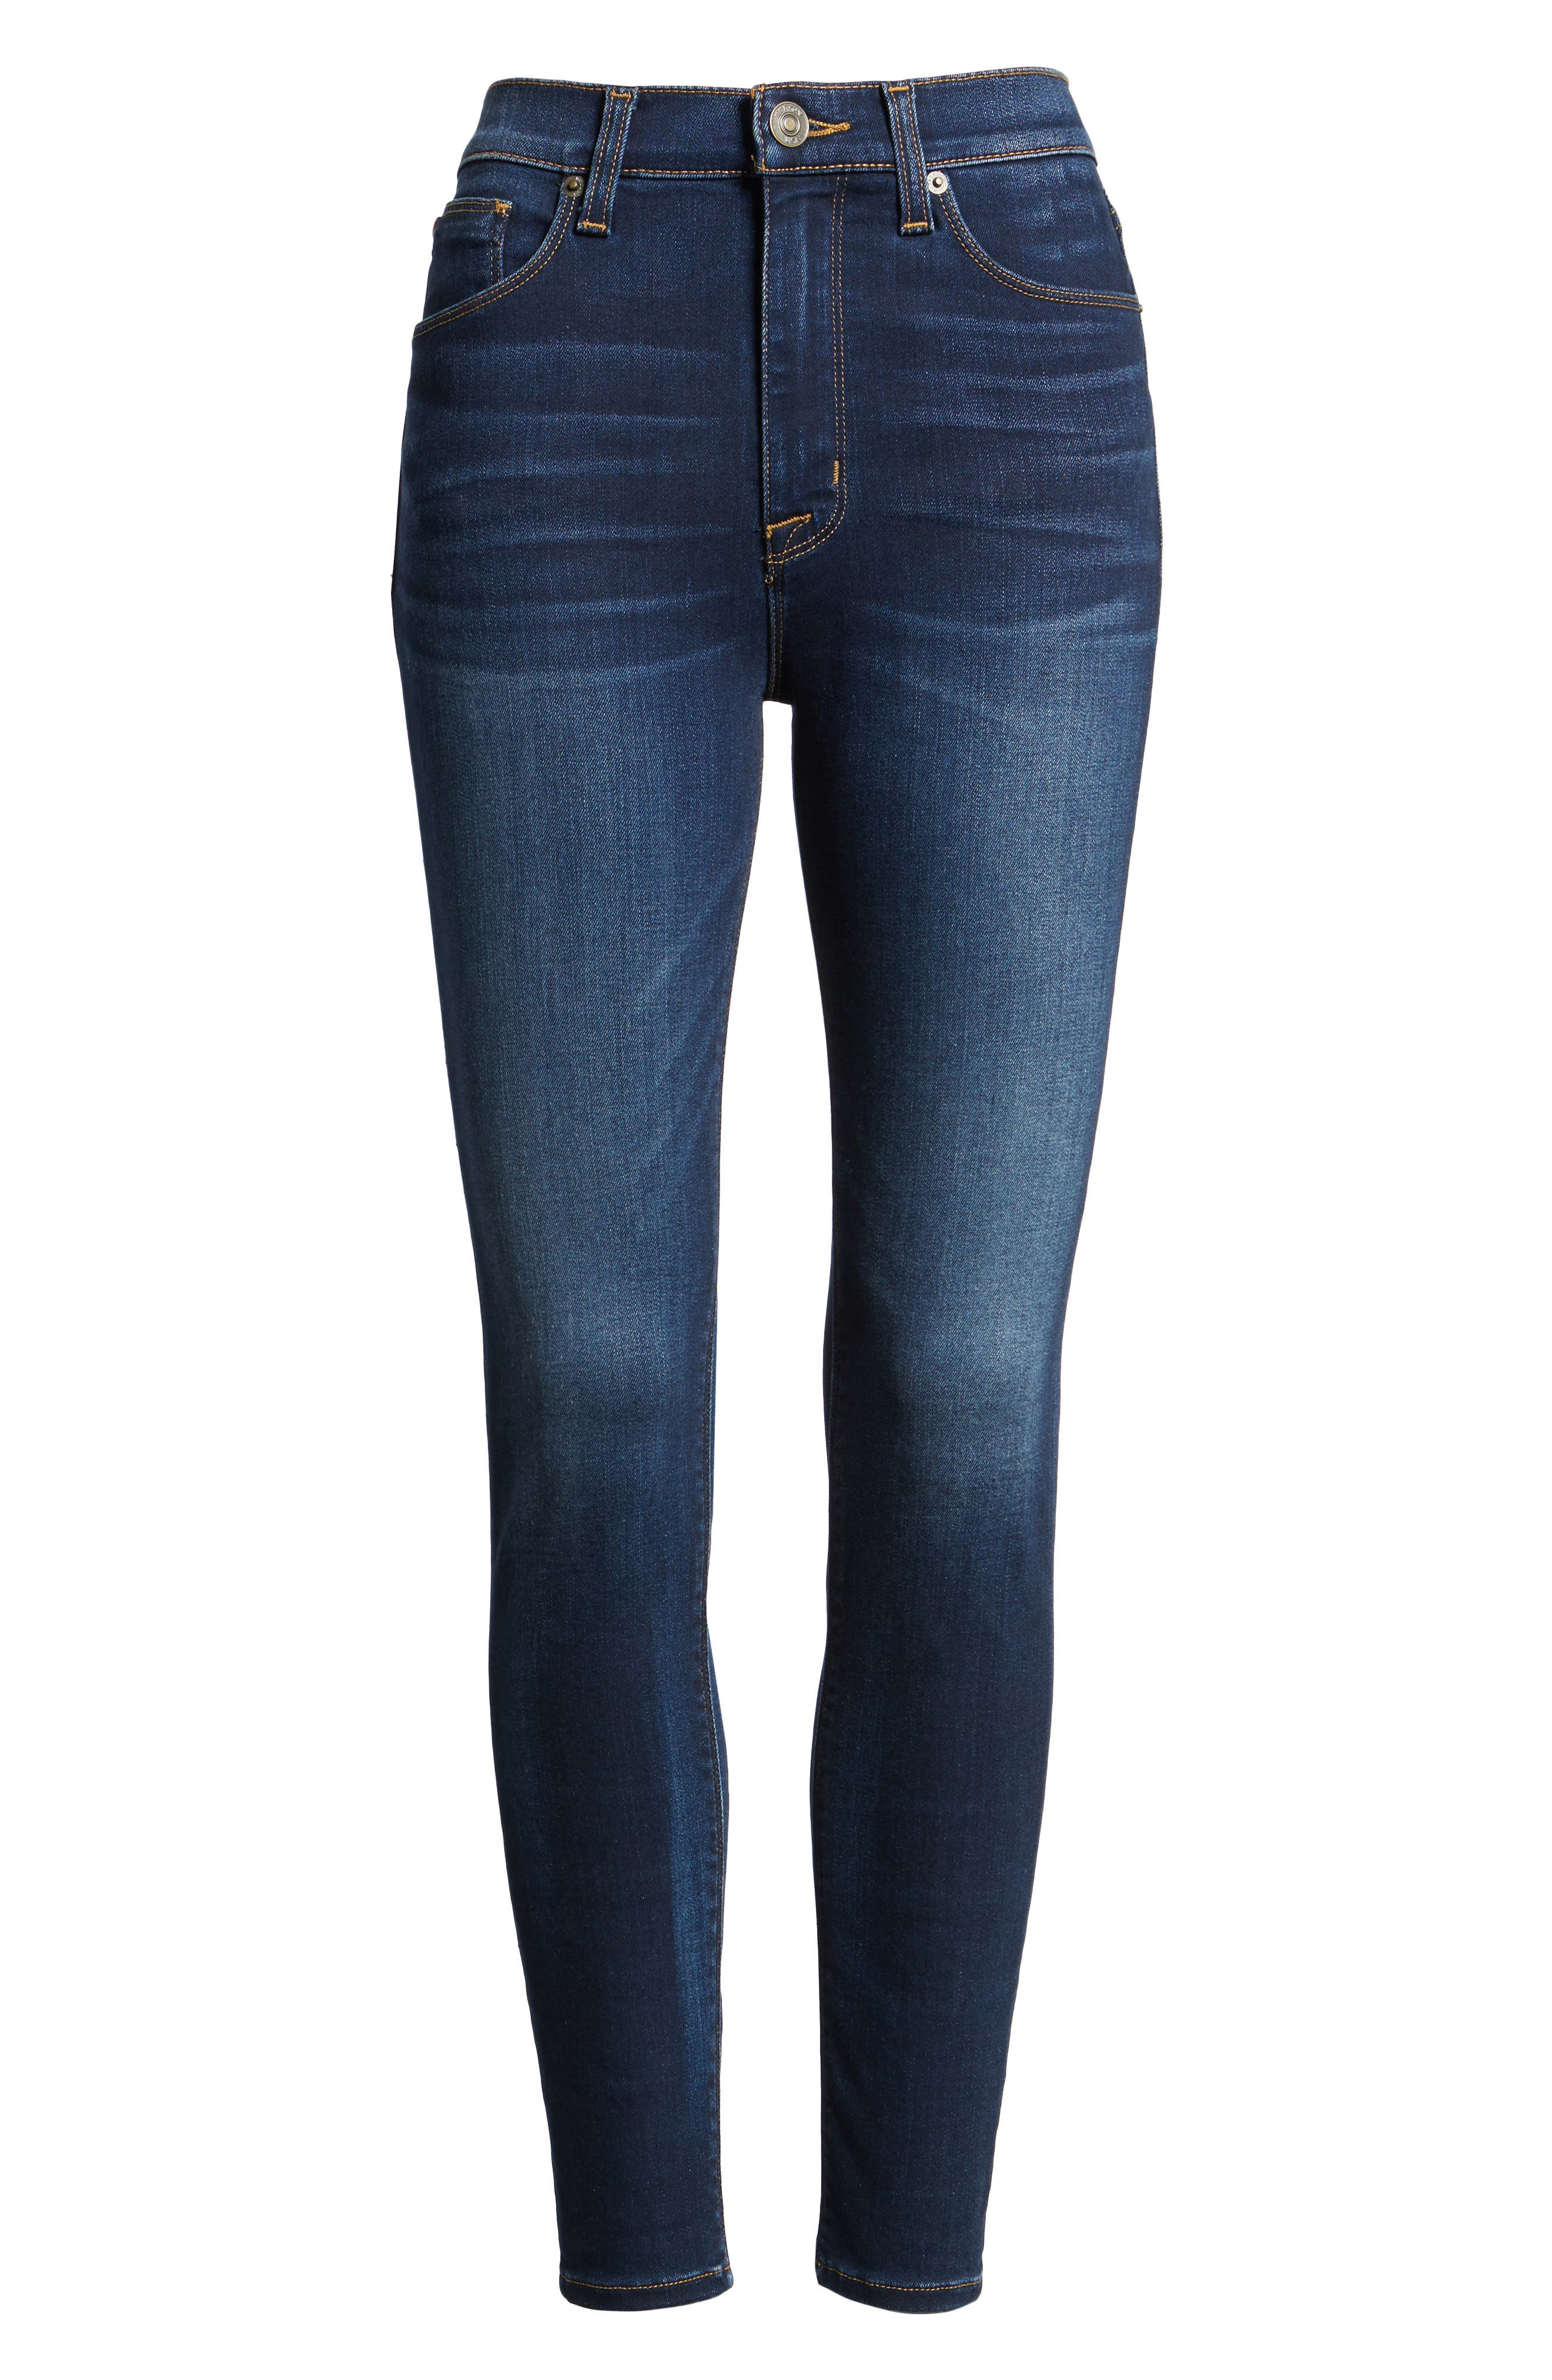 Barbara High Waist Super Skinny Jeans,                             Alternate thumbnail 12, color,